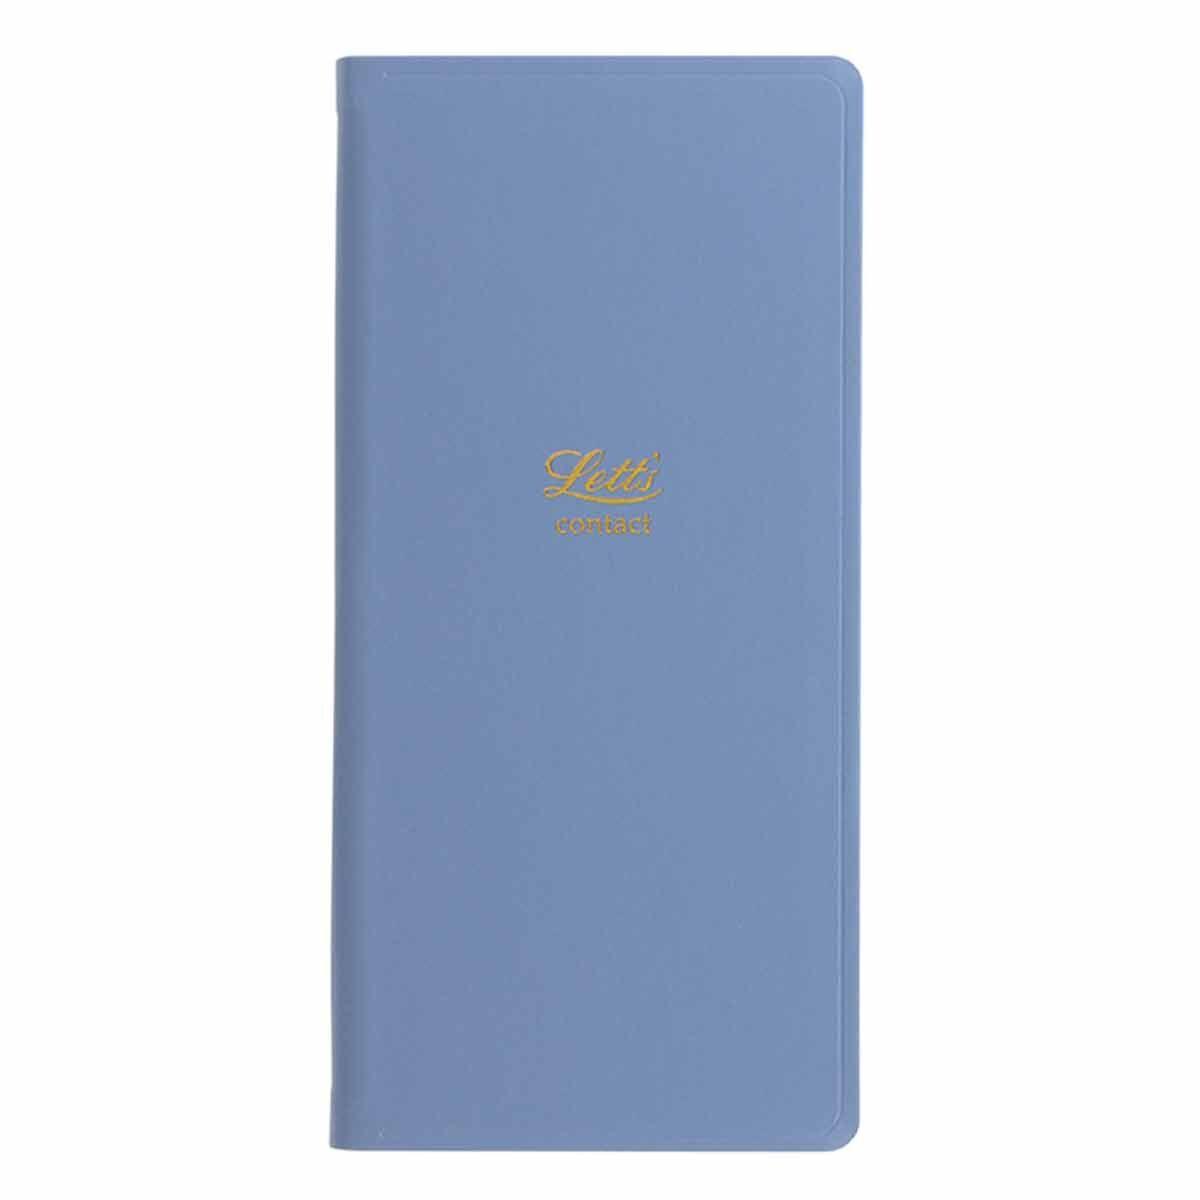 Letts Icon Slim Address Book Blue